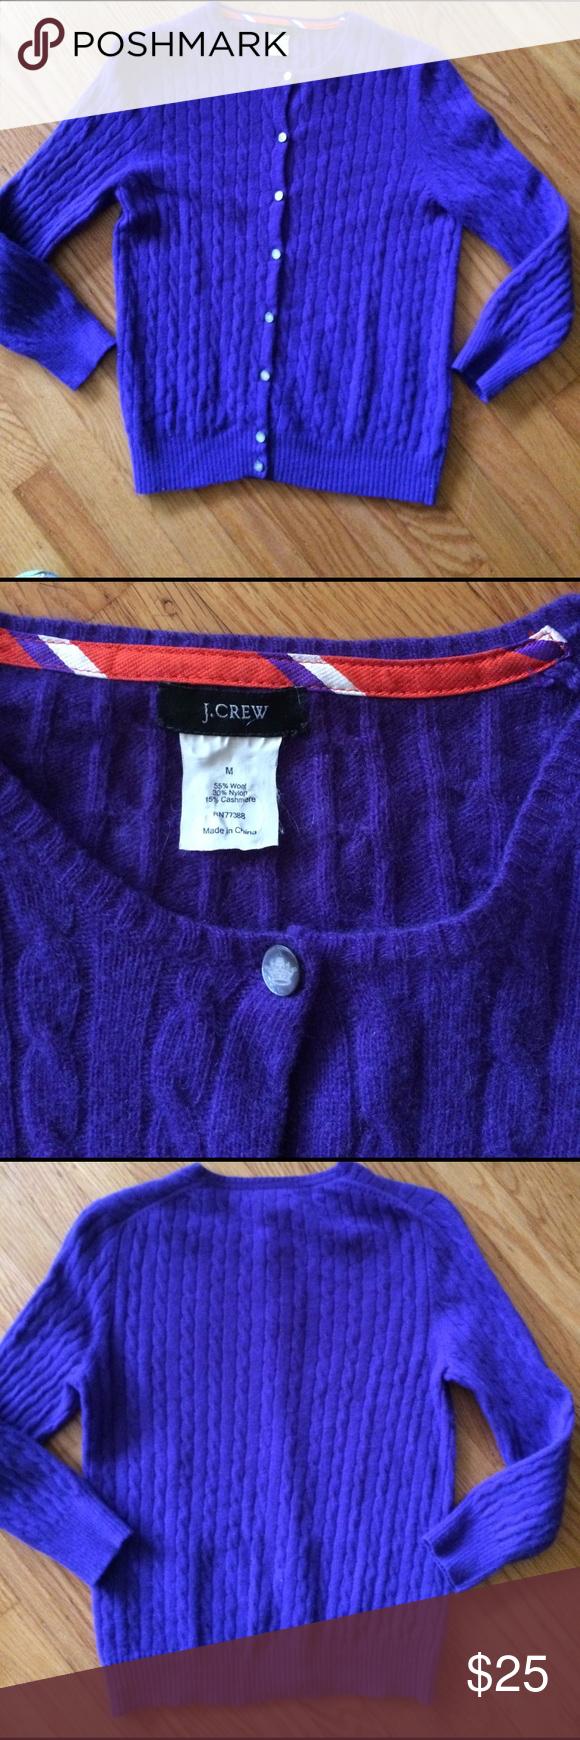 💜 J.Crew - Purple Cardigan Sweater; Misses Sz. S | Cashmere